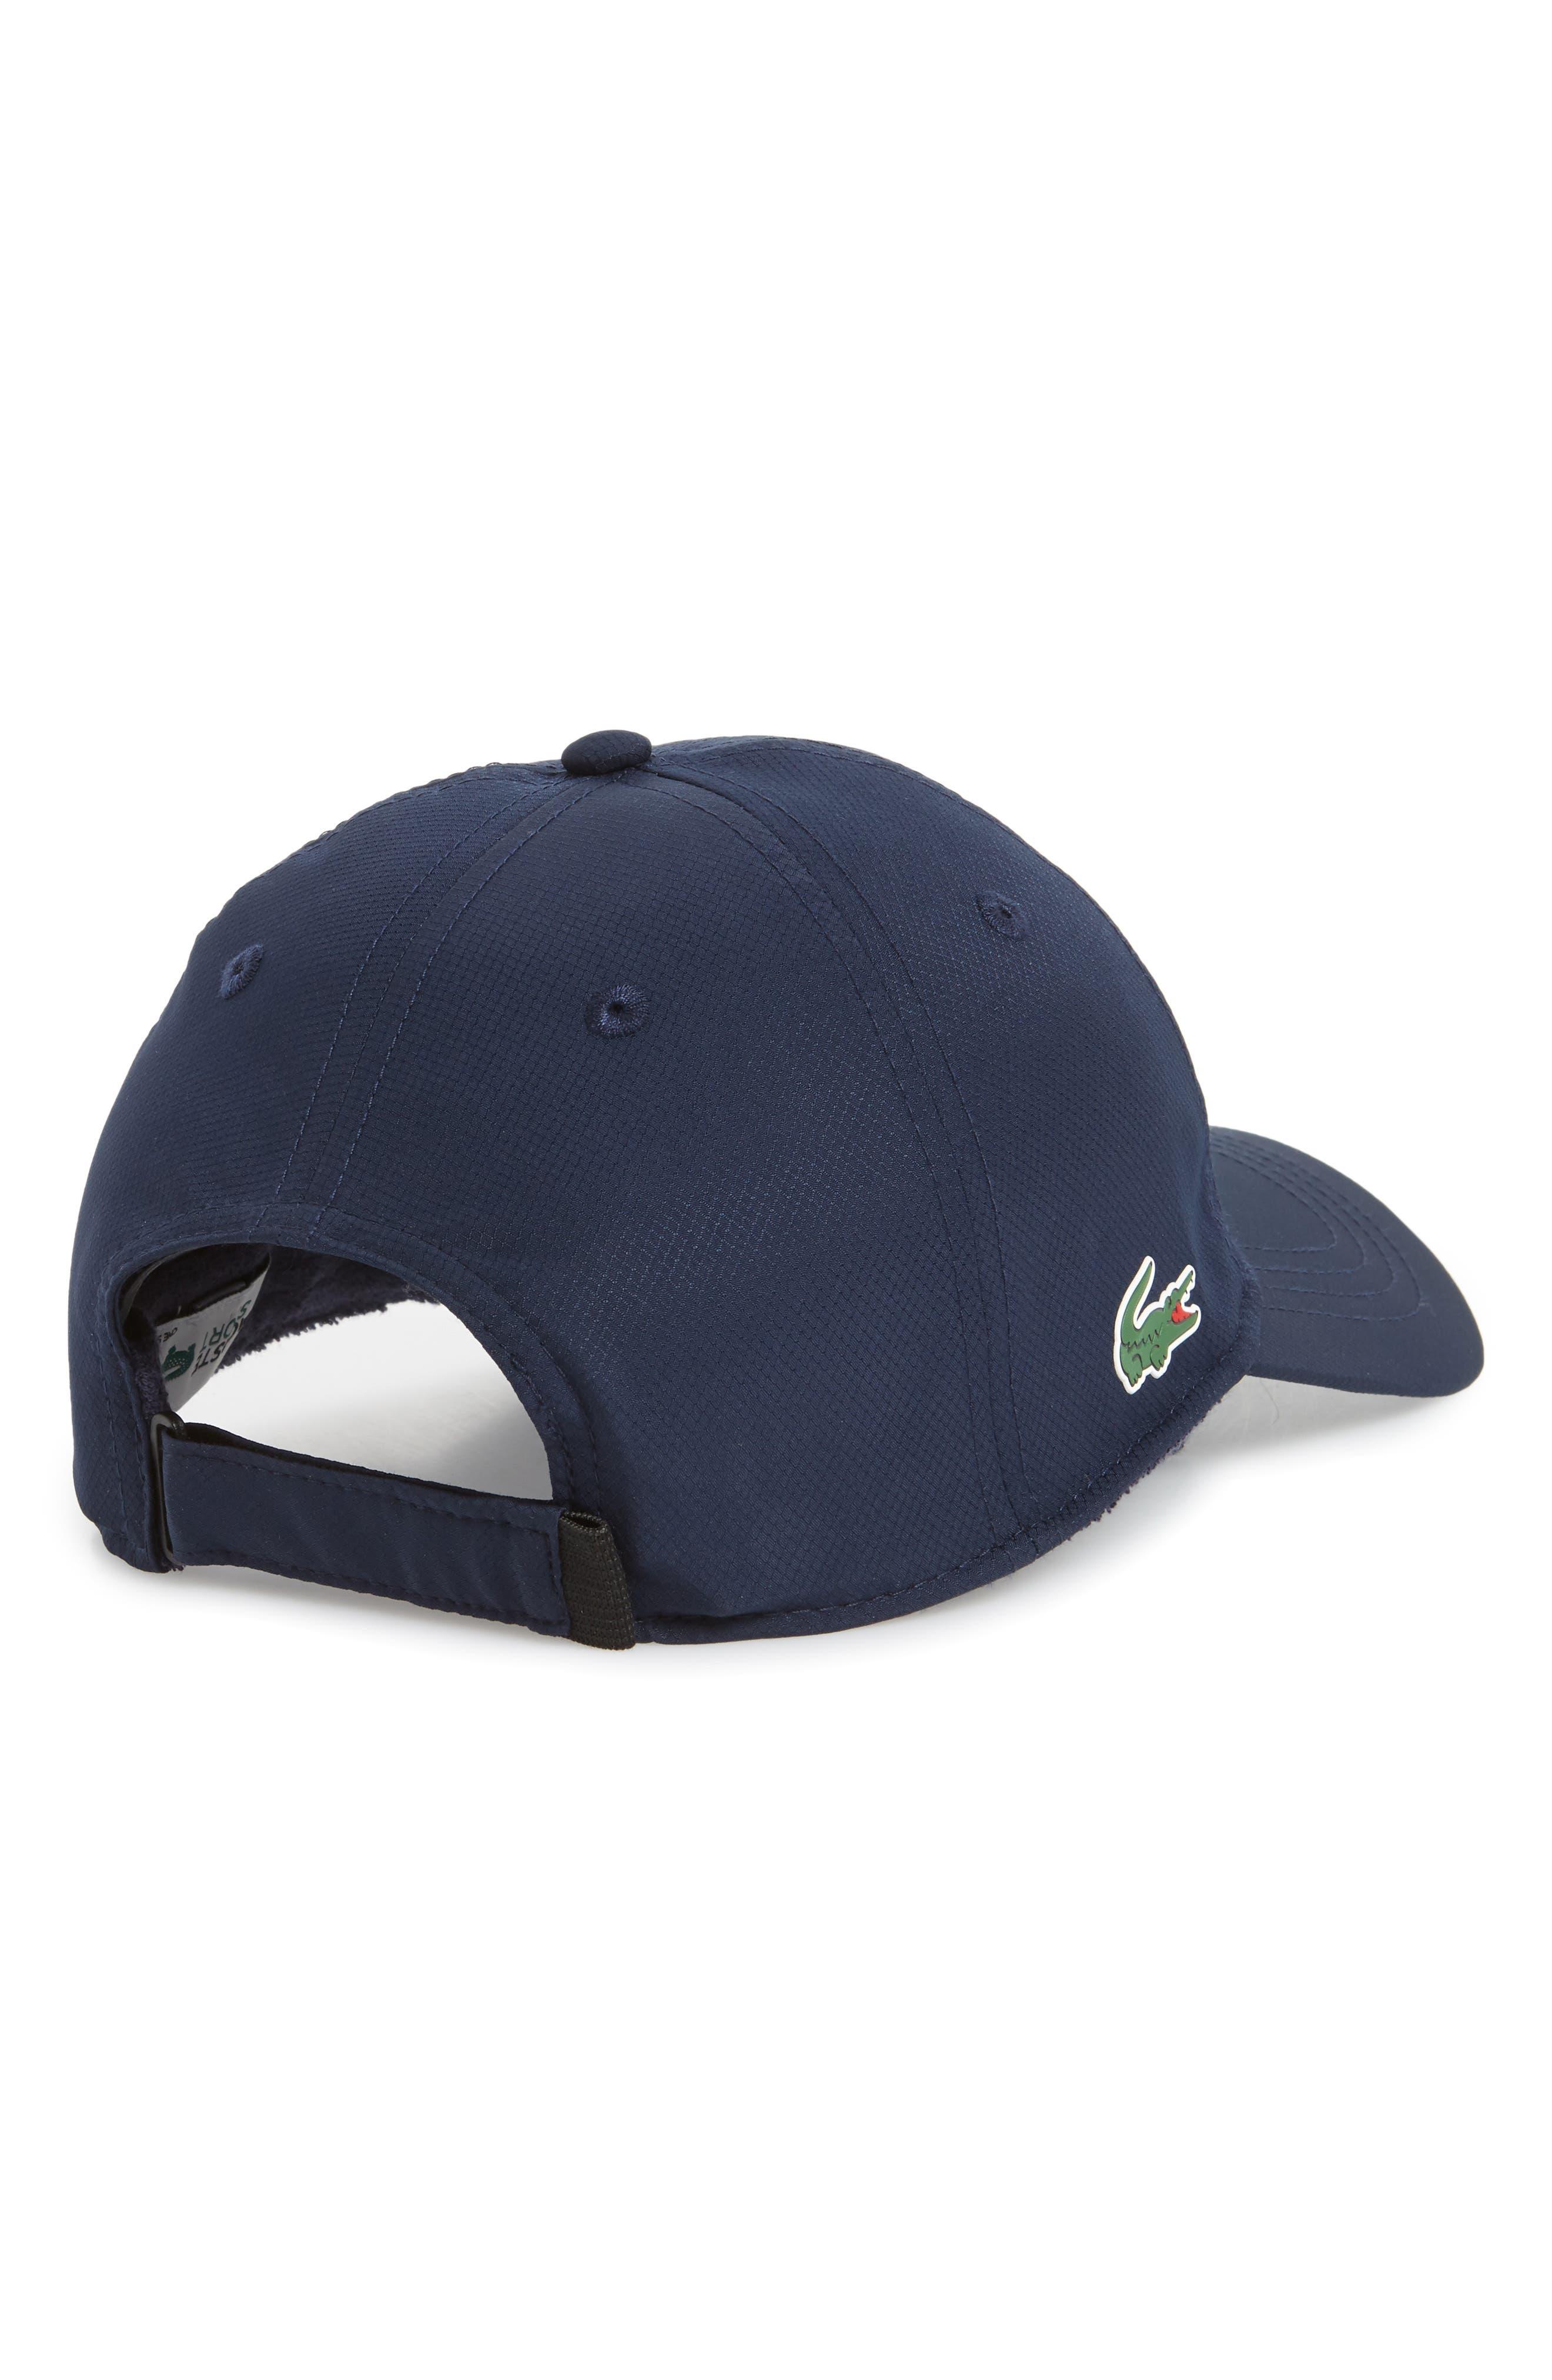 Sport Baseball Cap,                             Alternate thumbnail 2, color,                             Navy Blue